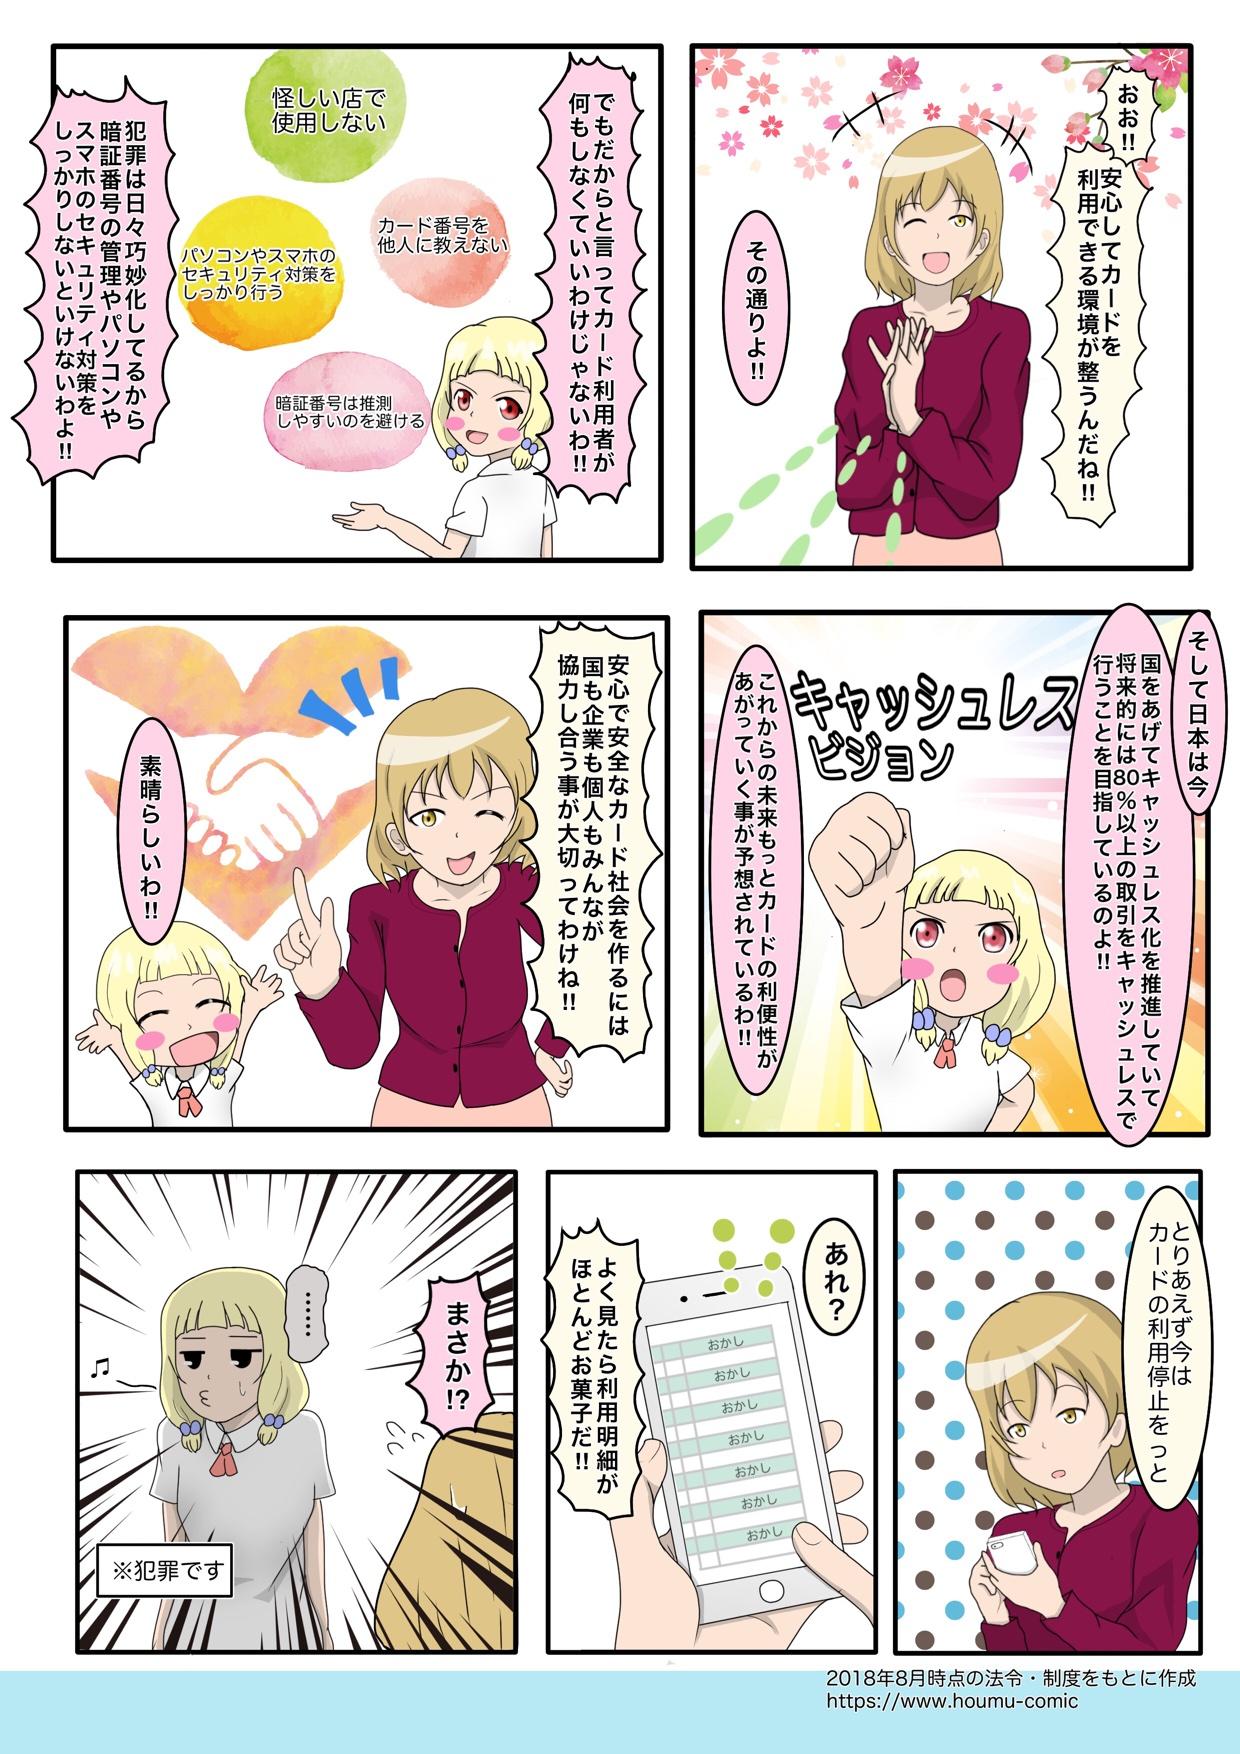 f:id:houmu_comic:20180814232349j:plain